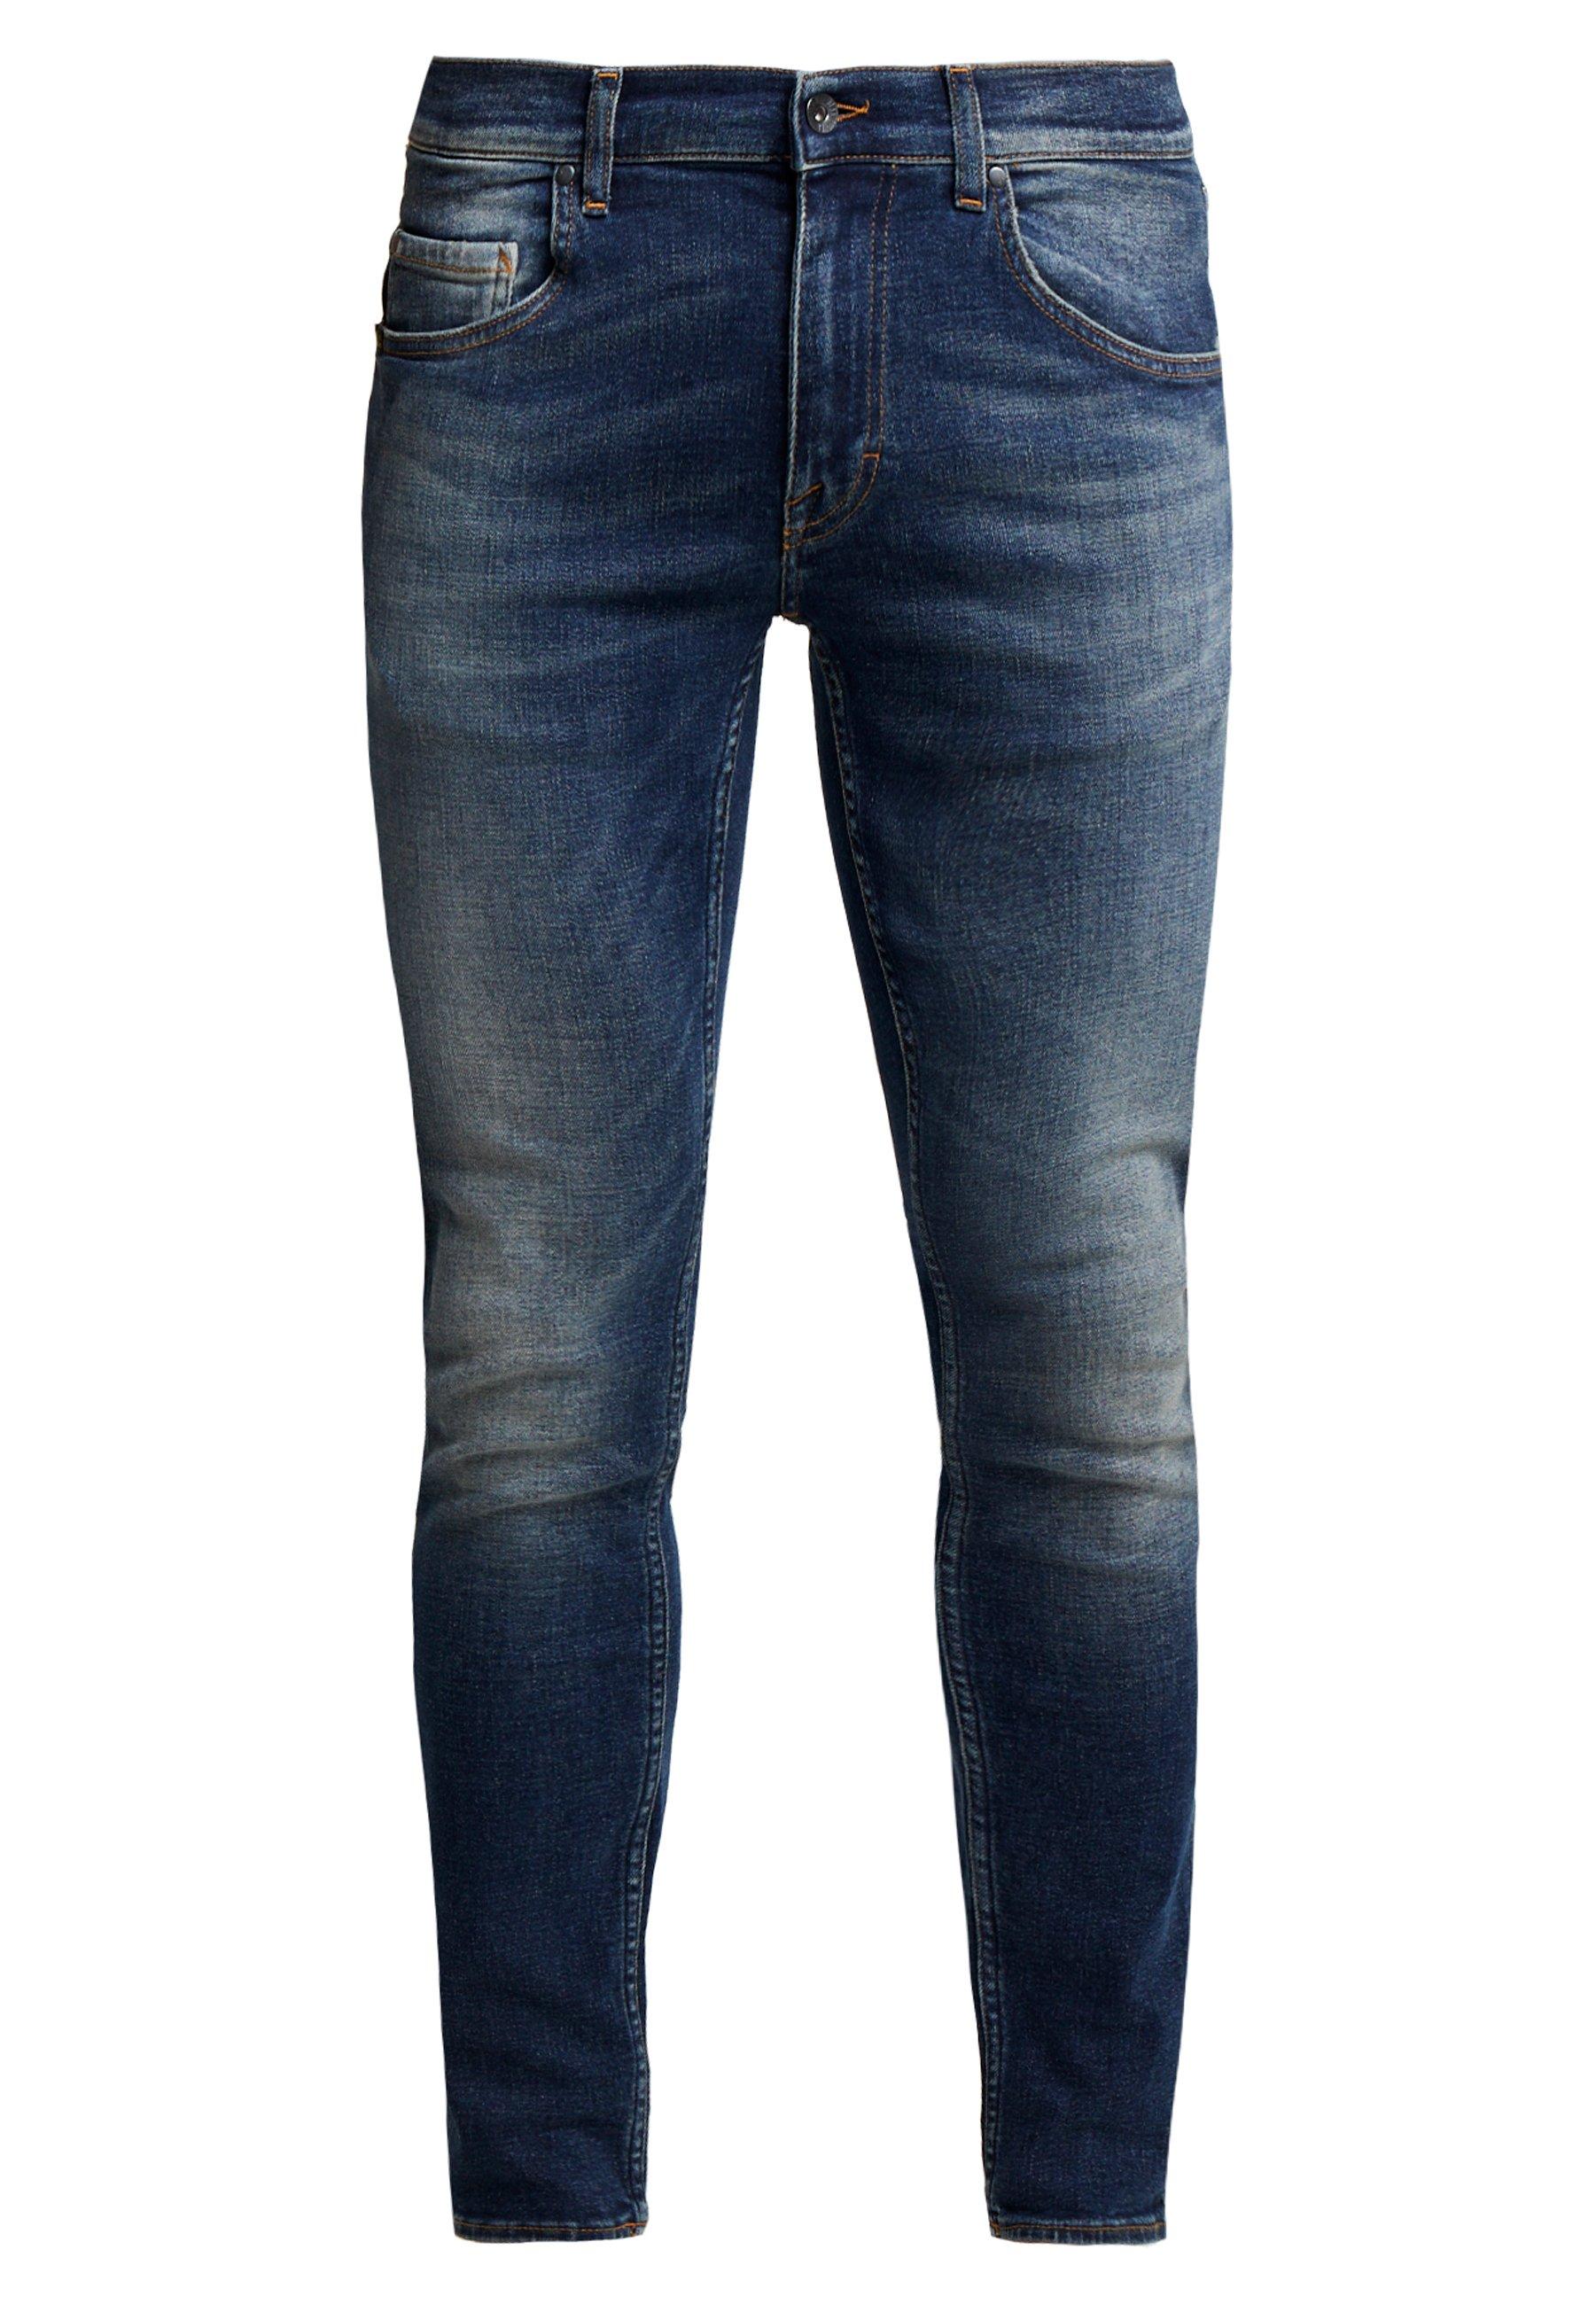 Tiger of Sweden Jeans Jeans Skinny - midnight blue